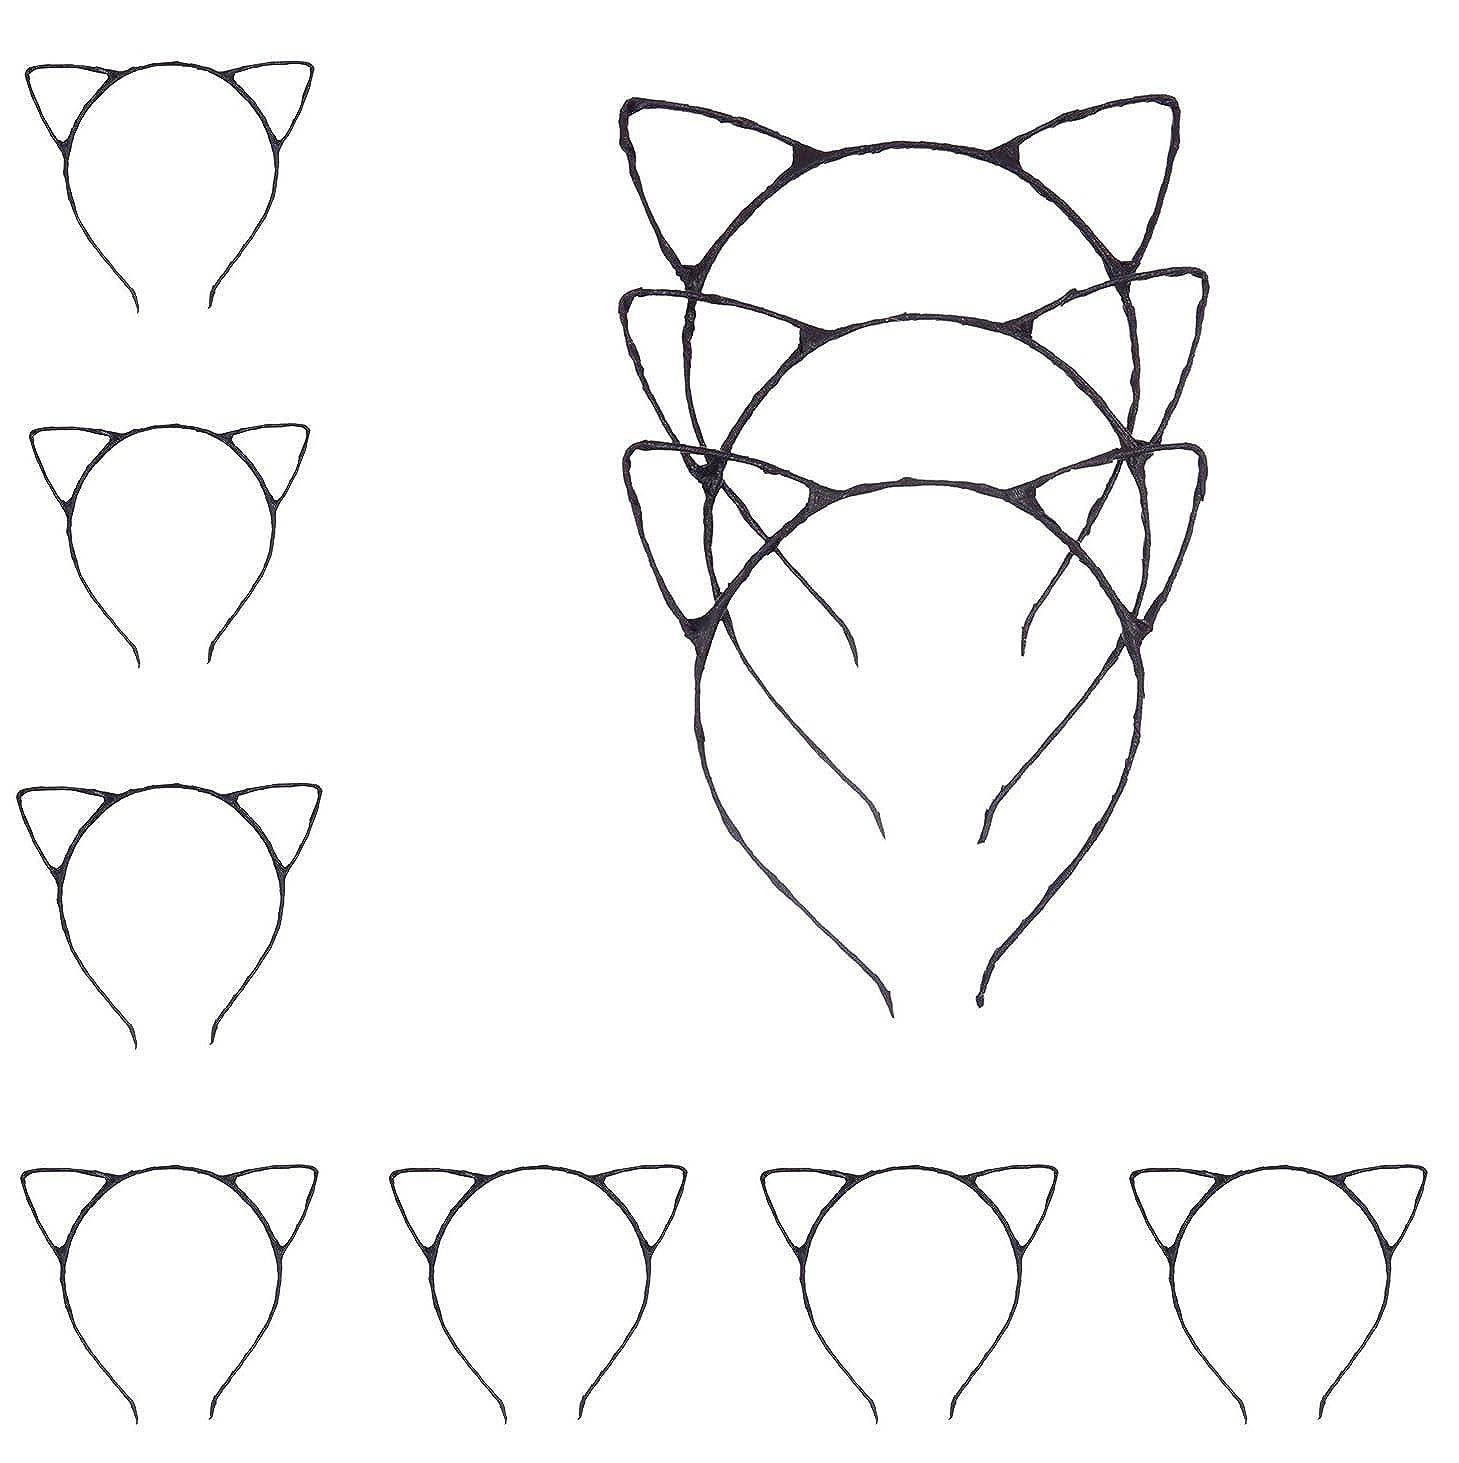 Bonnie Z Leonardo Girls光沢猫耳ヘアバンドヘッドバンド  Glossy Cat Ears Headband Black 10pcs B0727QZLGS